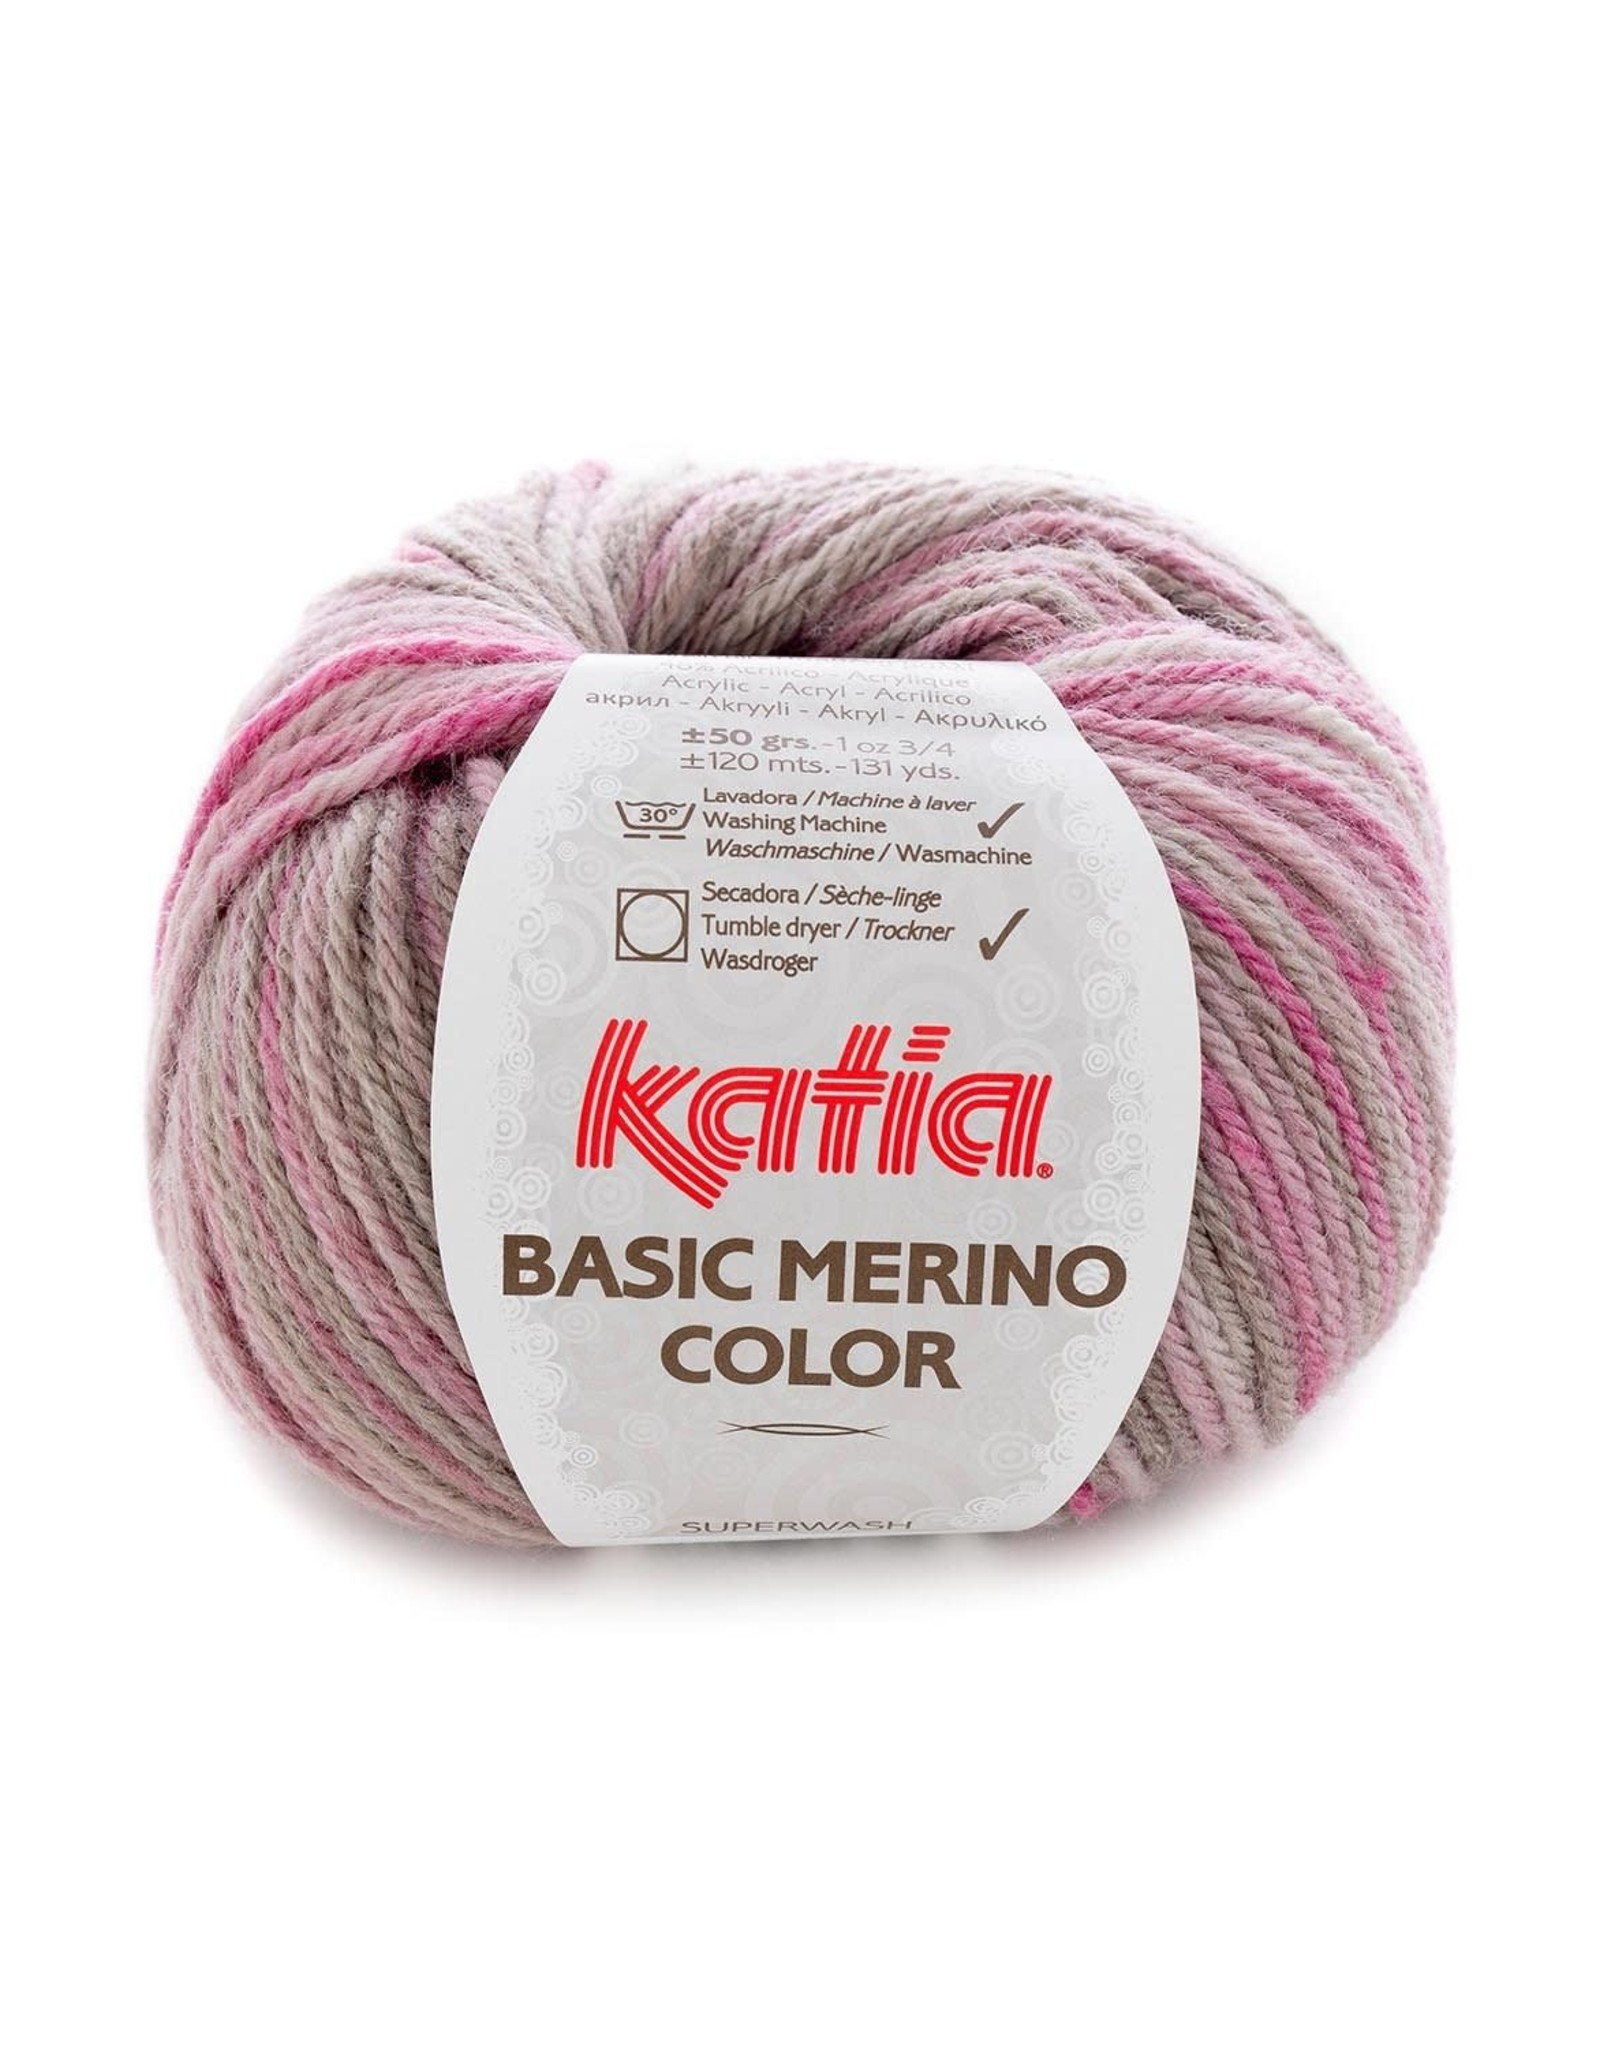 Katia Katia Basic Merino Color 202 - Grijs-Bleekrood